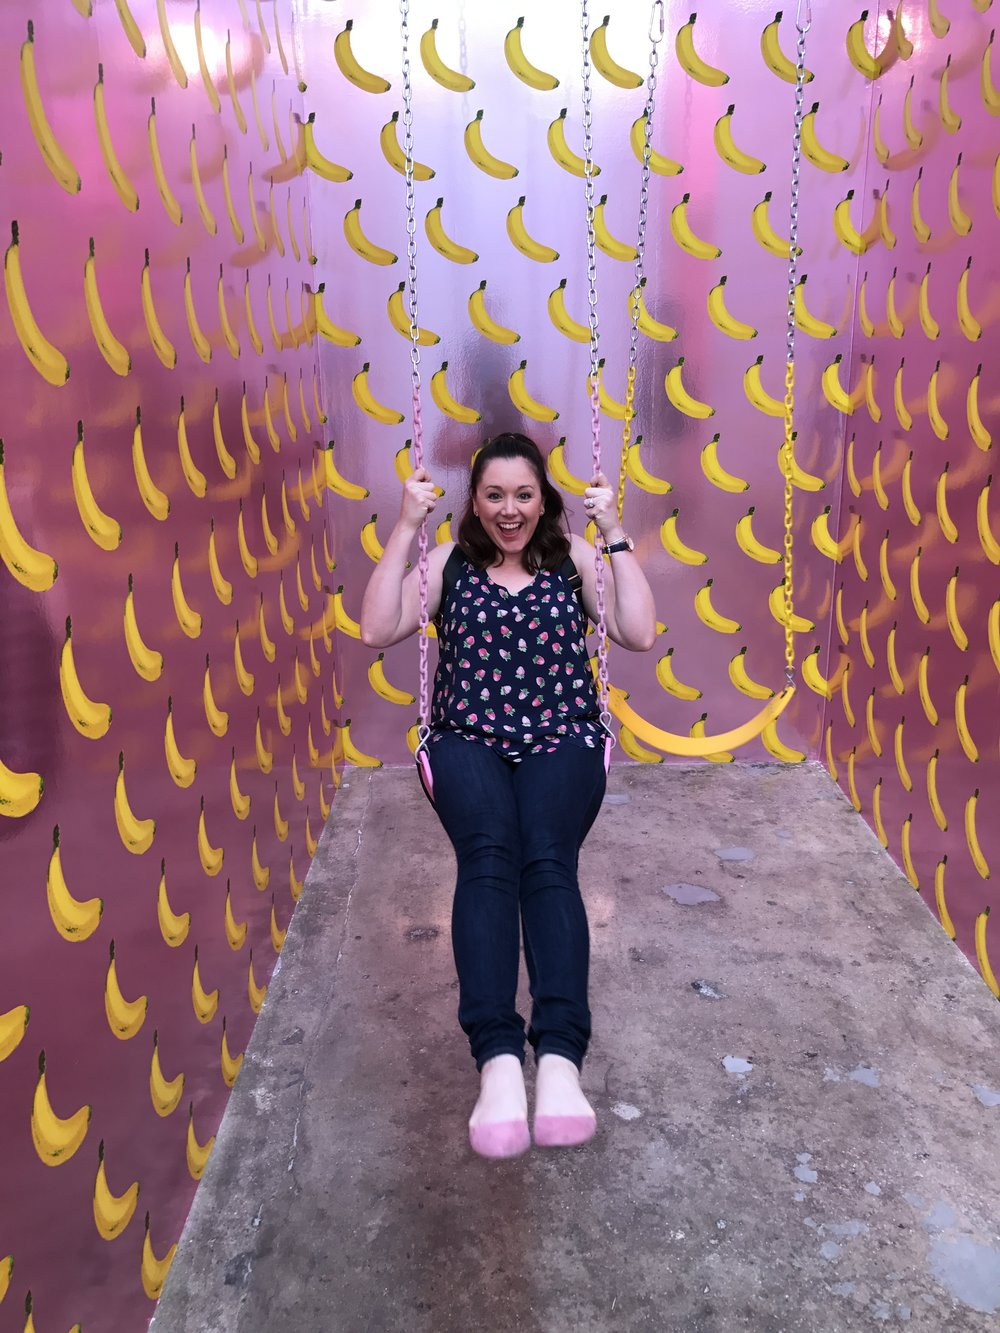 Museum of Ice Cream Swing - Wandering Jokas Travel and Ice Cream Blog